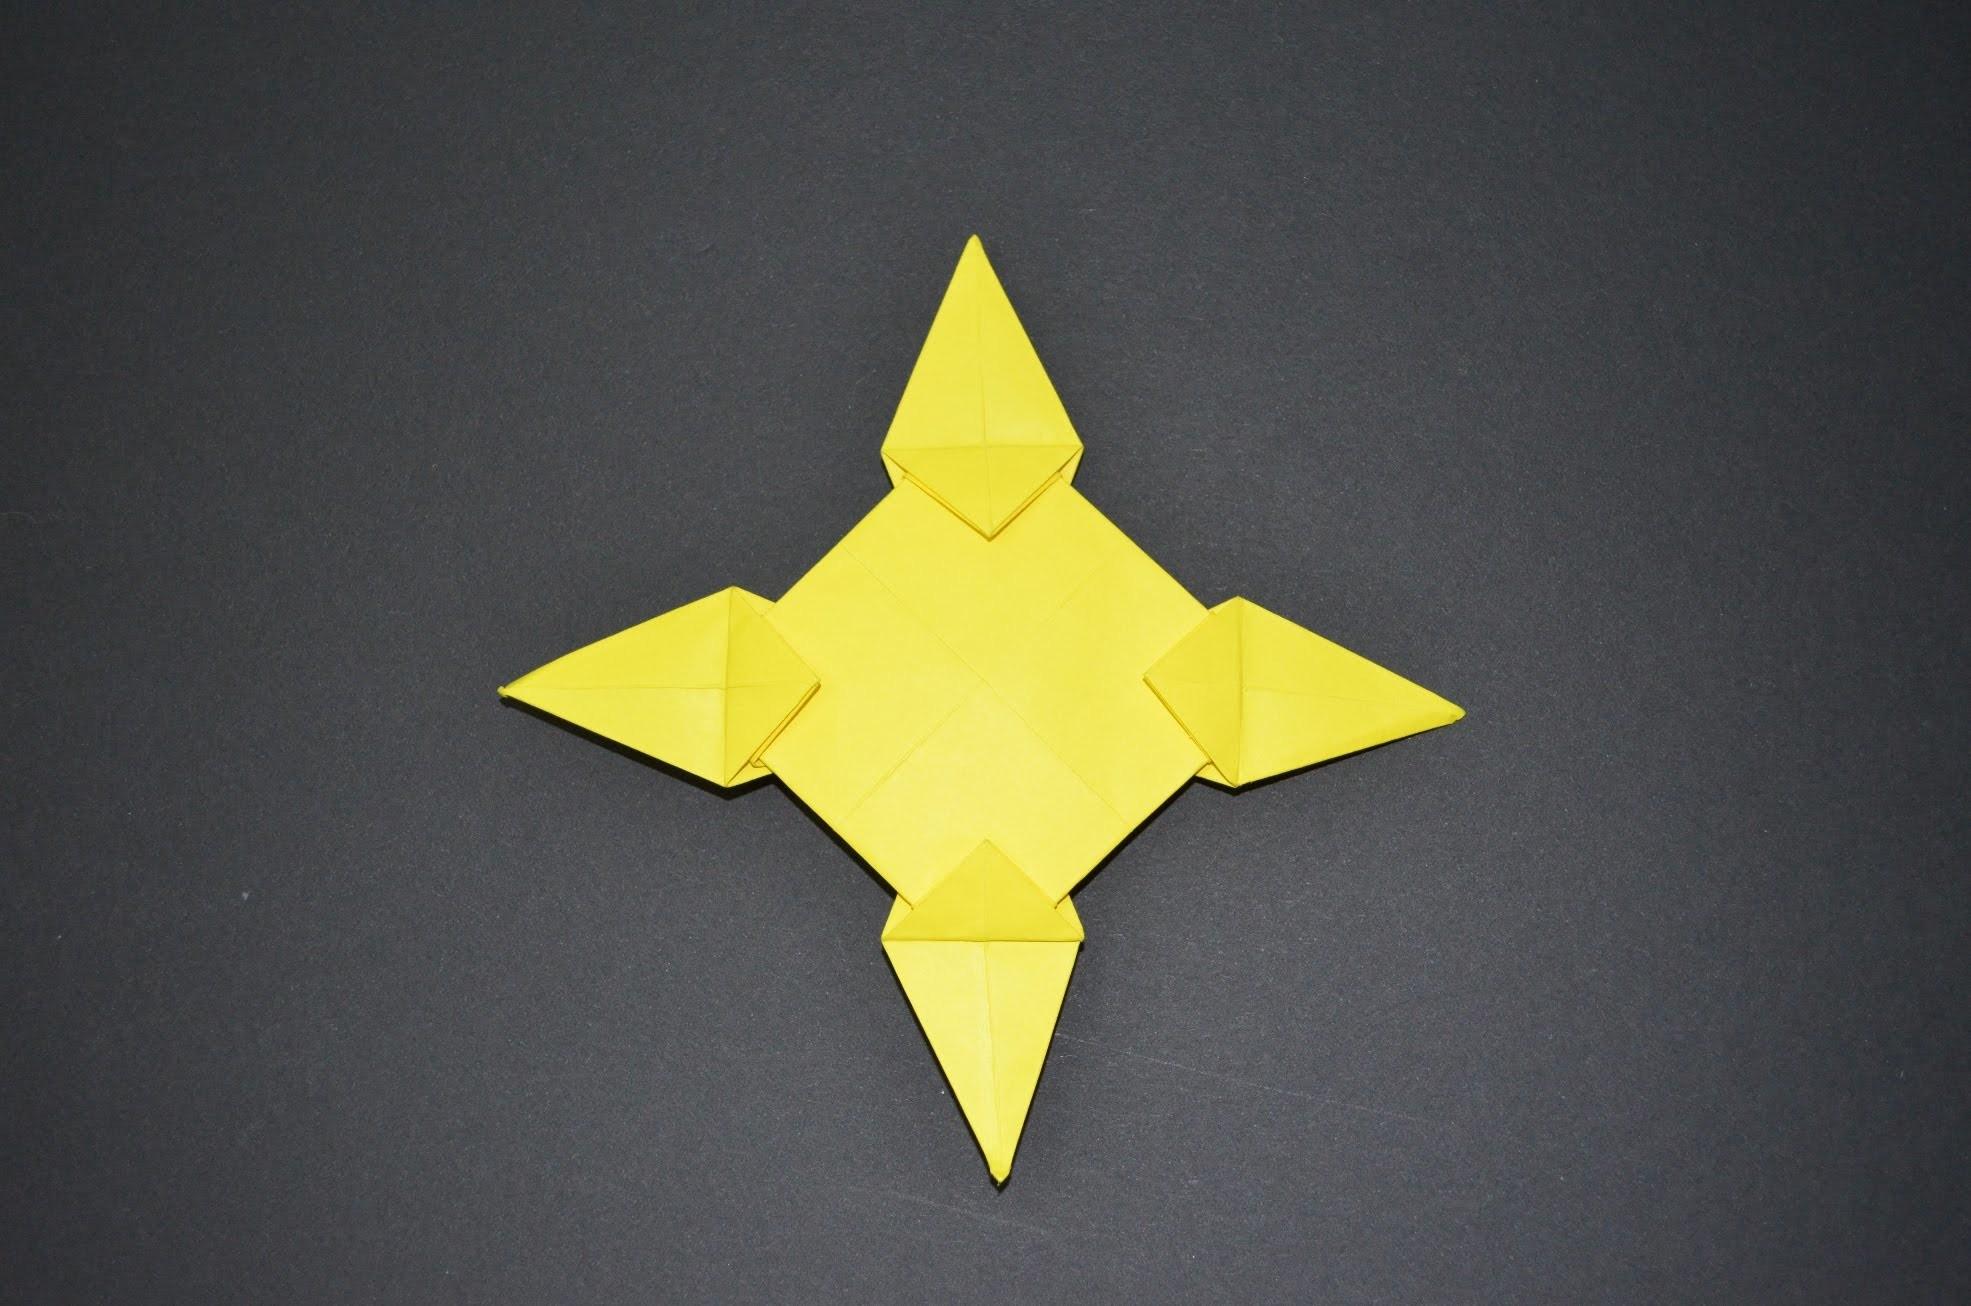 ninja throwing star origami